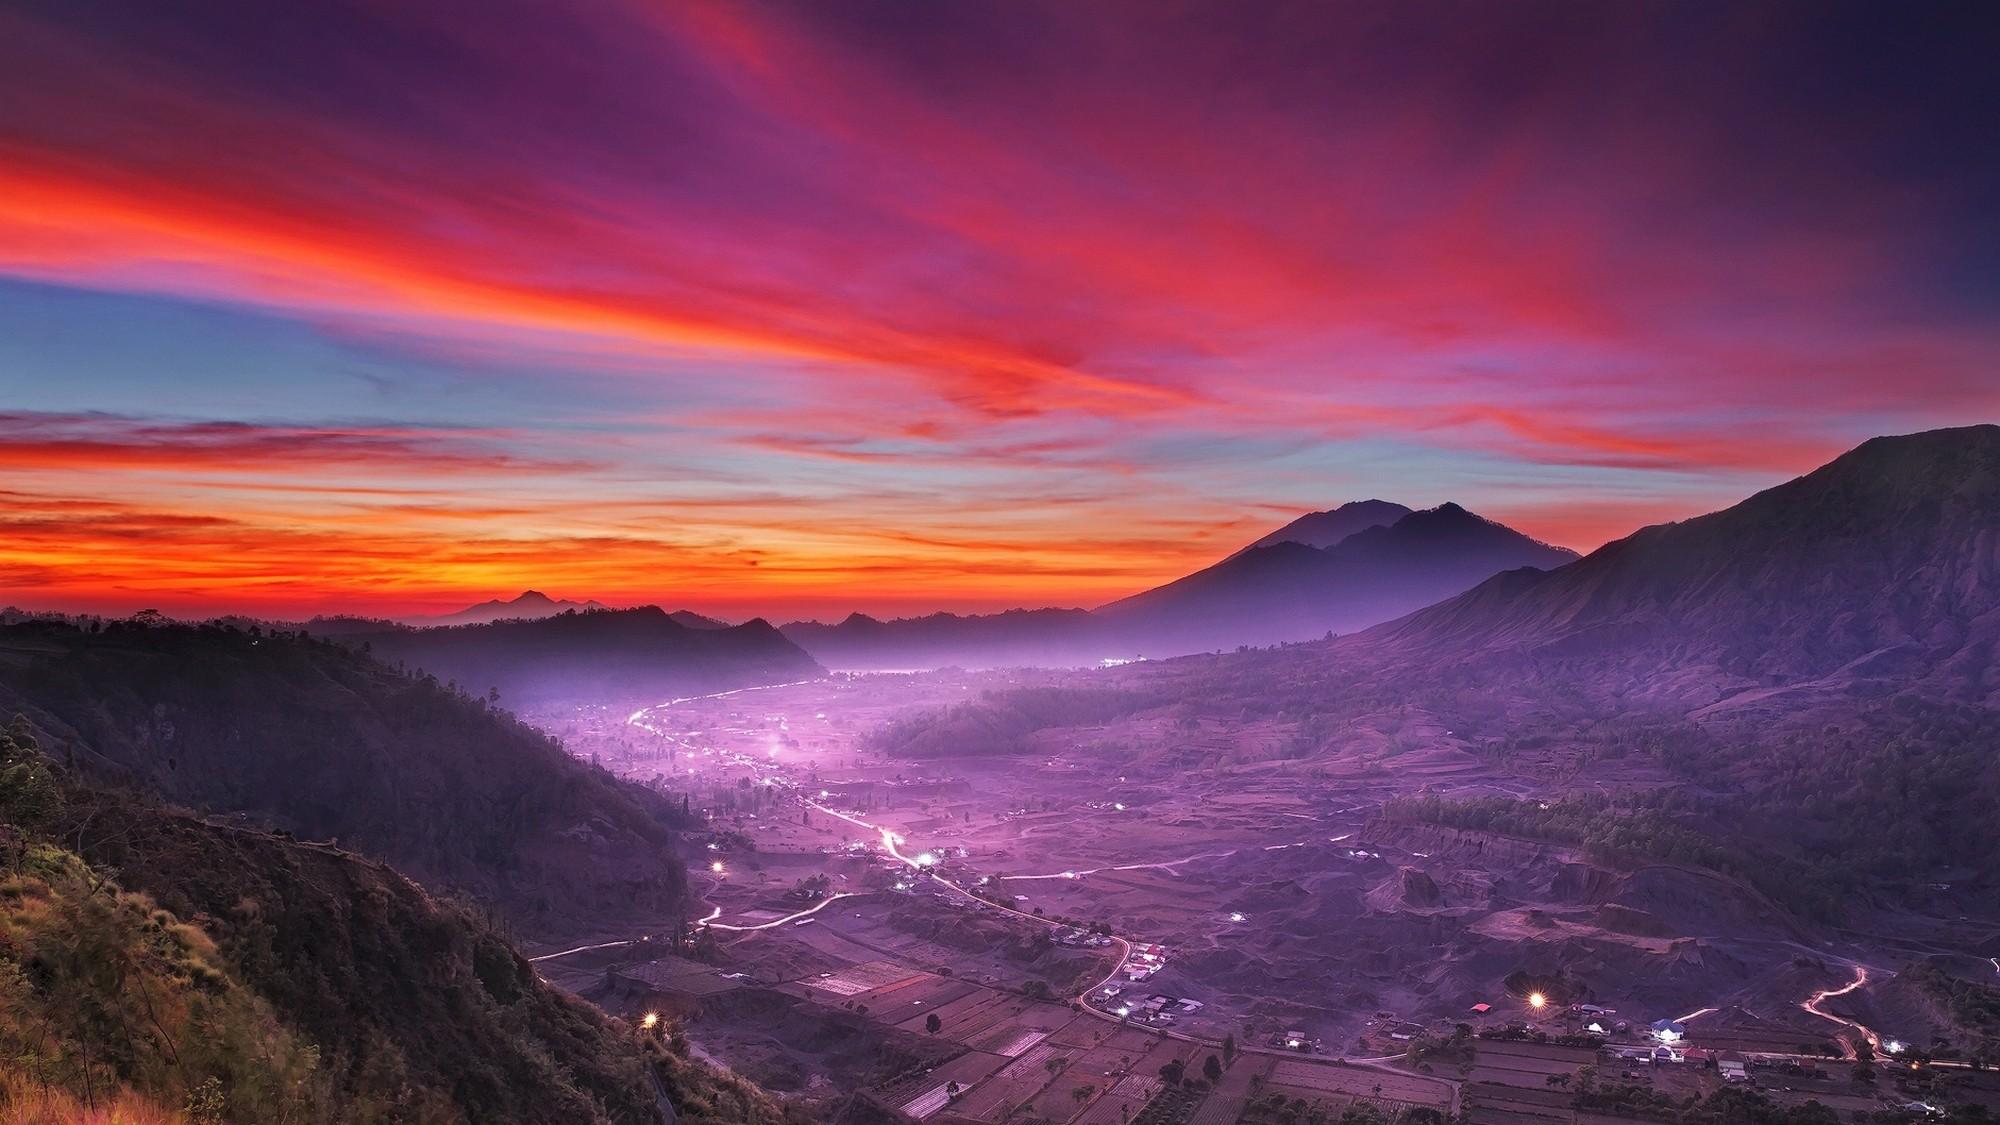 indonesia landscape nature